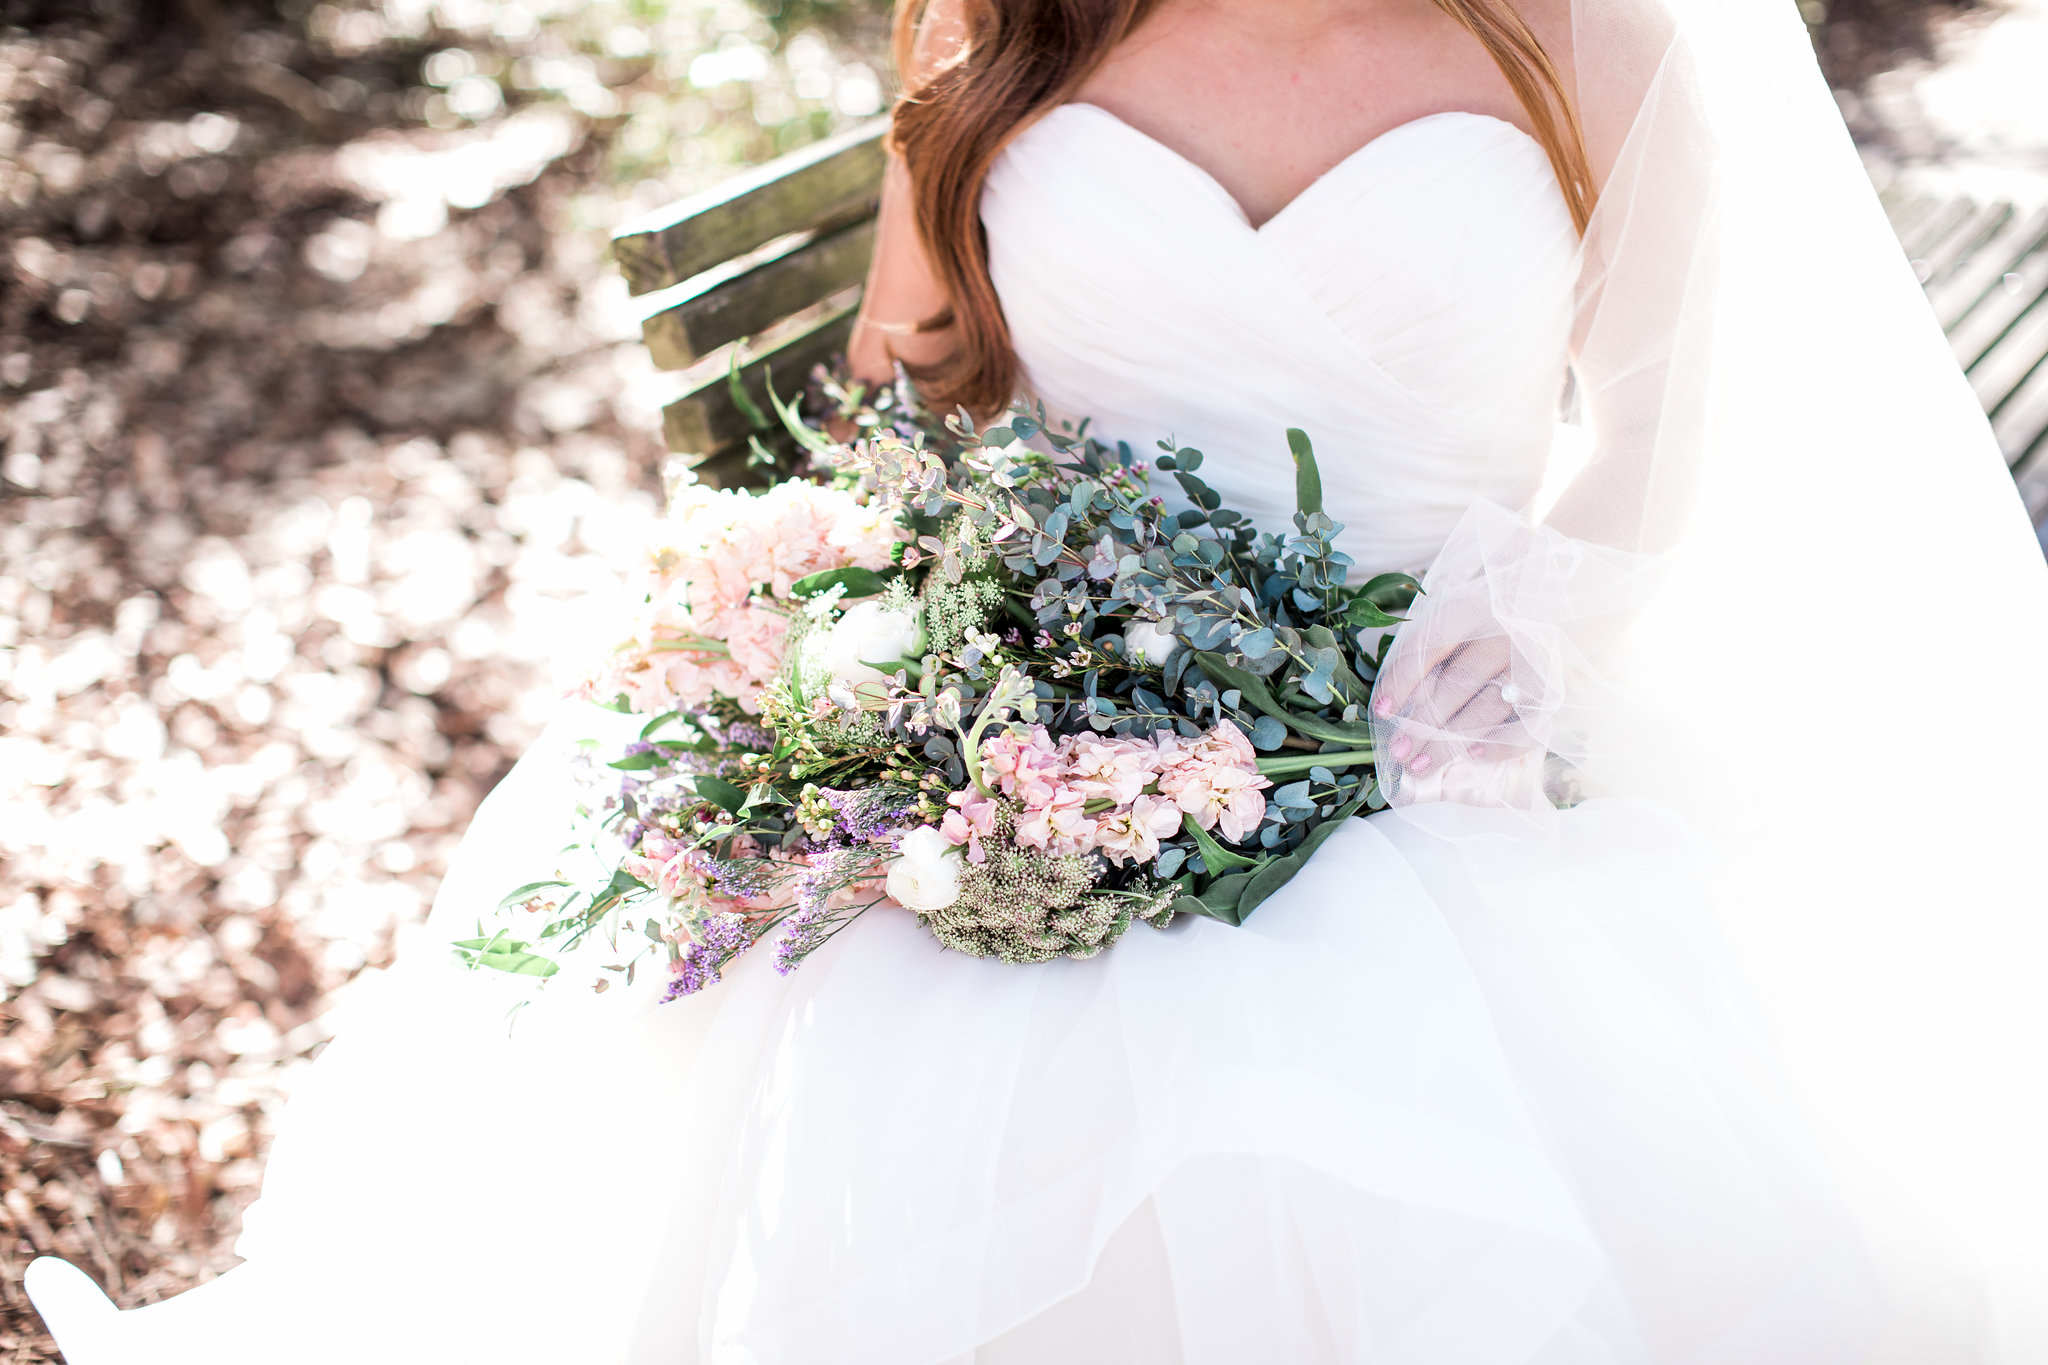 apt-b-photography-mary-elizabeths-bridal-boutique-adele-amelia-accessories-morilee-5504-savannah-bridal-boutique-savannah-weddings-savannah-wedding-photographer-savannah-bridal-gowns-savannah-wedding-dresses-historic-savannah-wedding-16.jpg